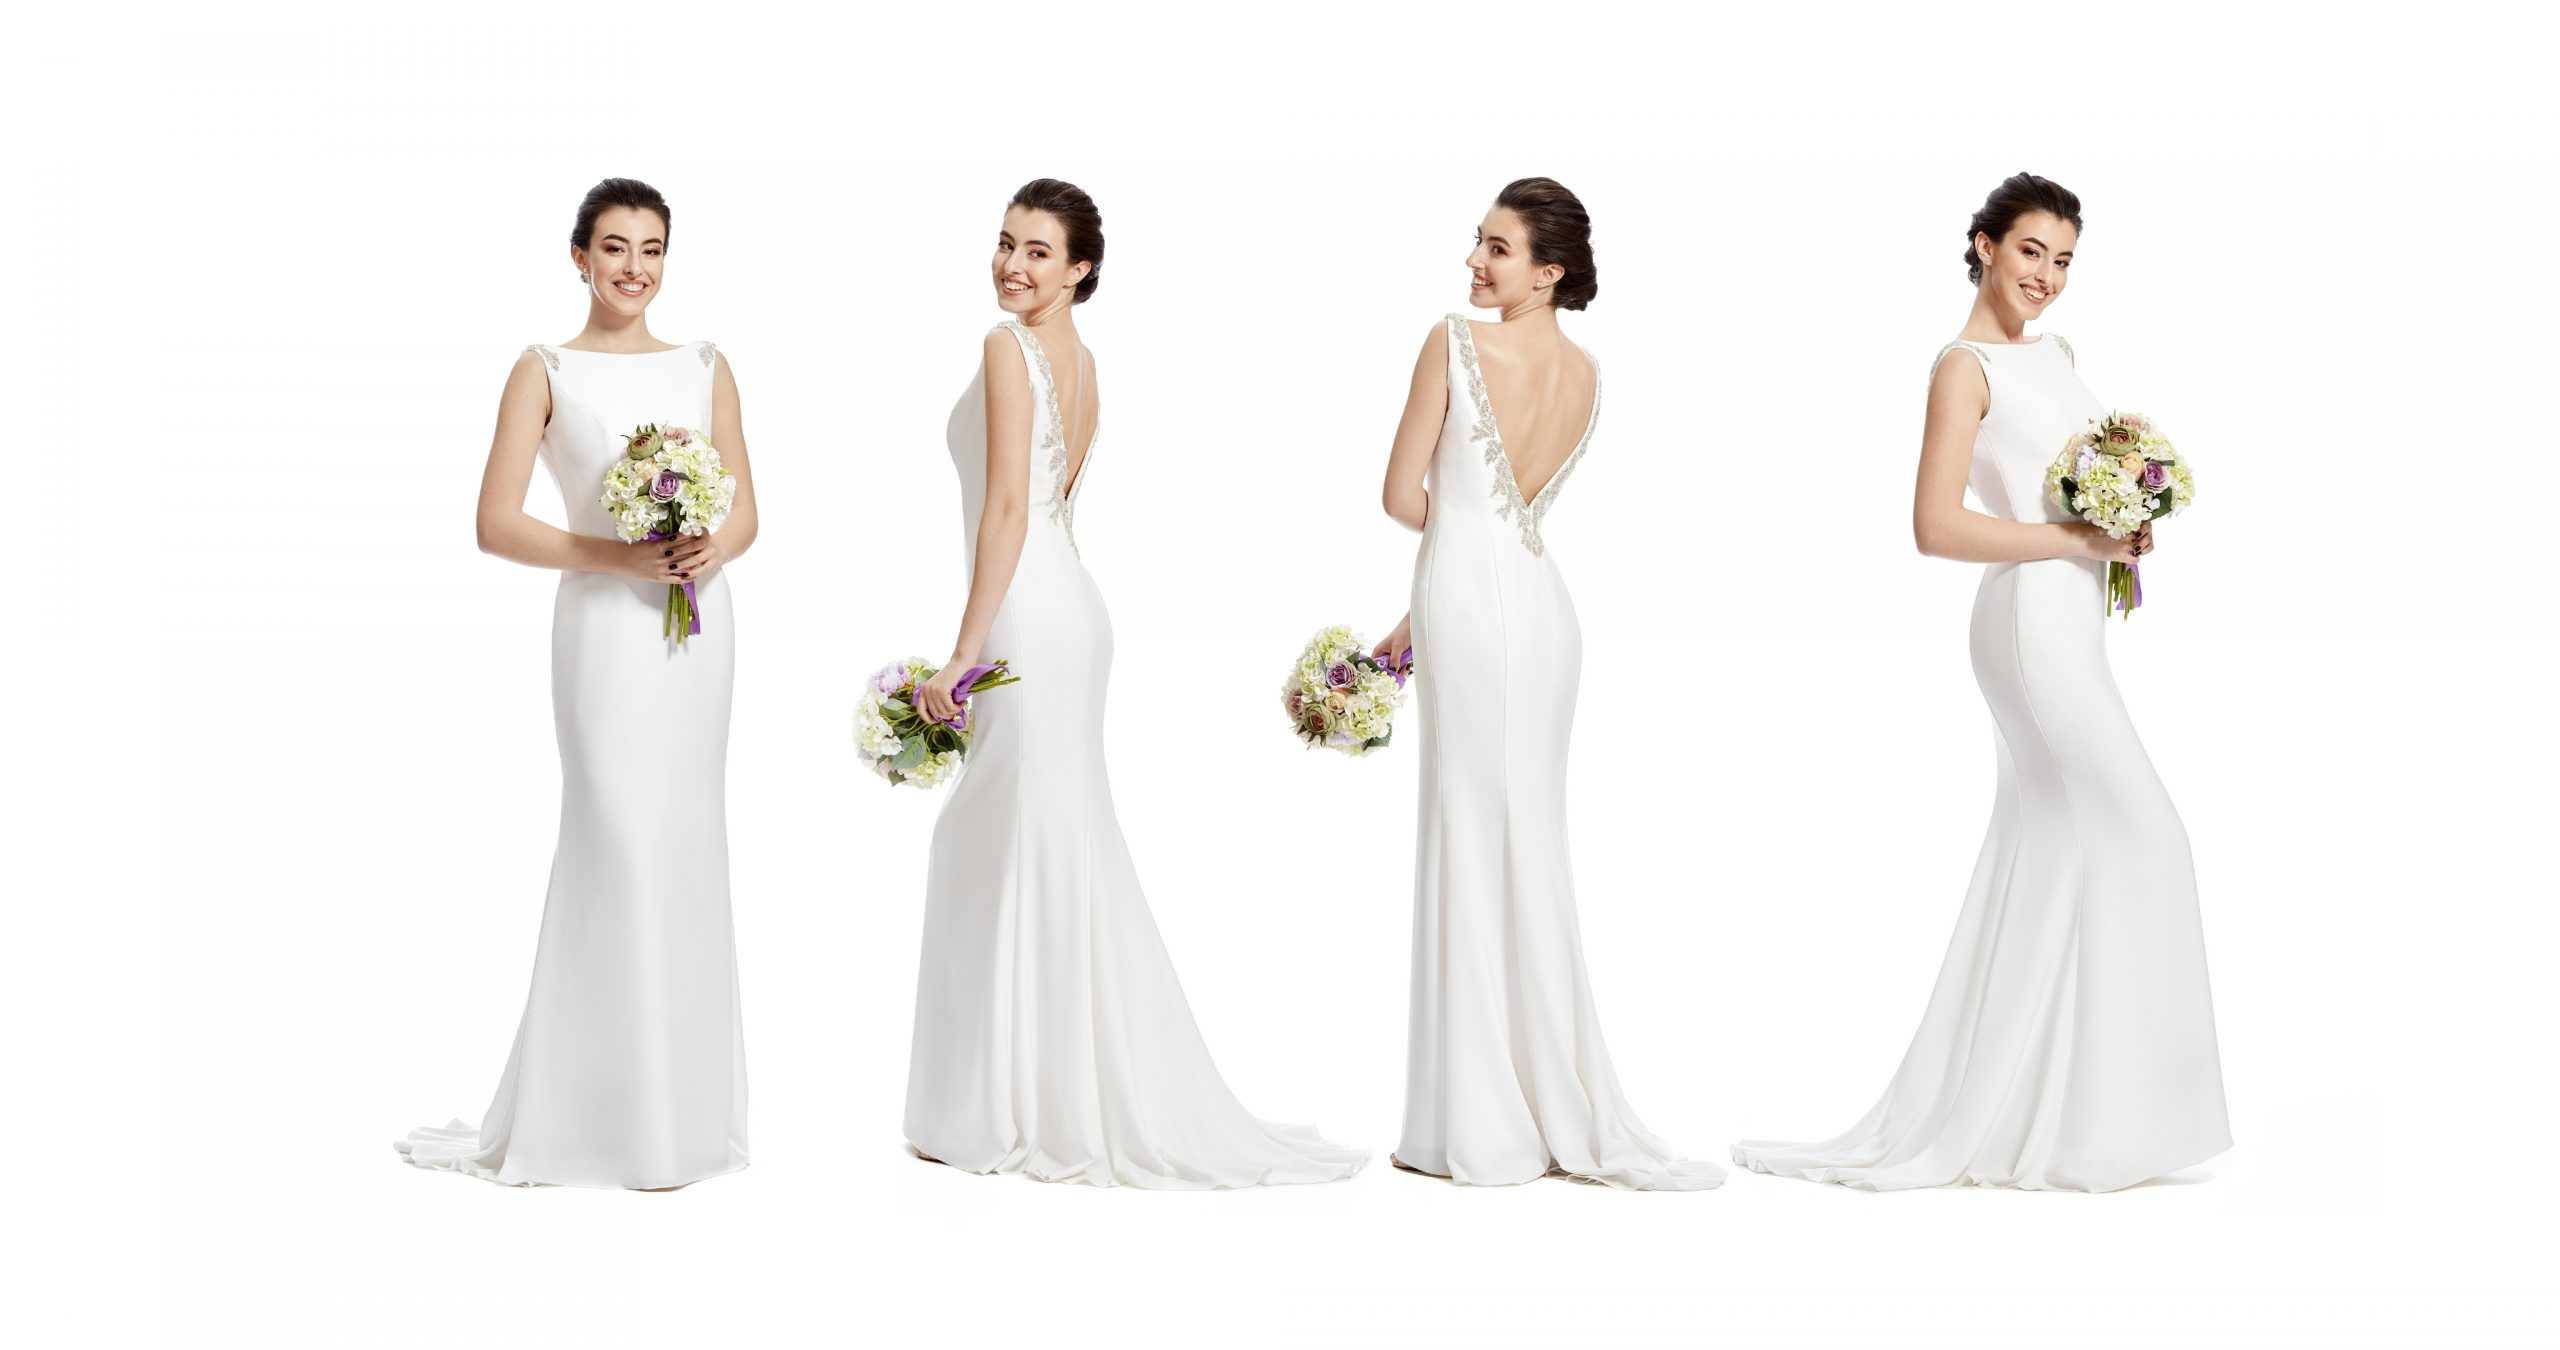 fashion-bridal-shoot-wedding-gown-catalog-advertising-photography